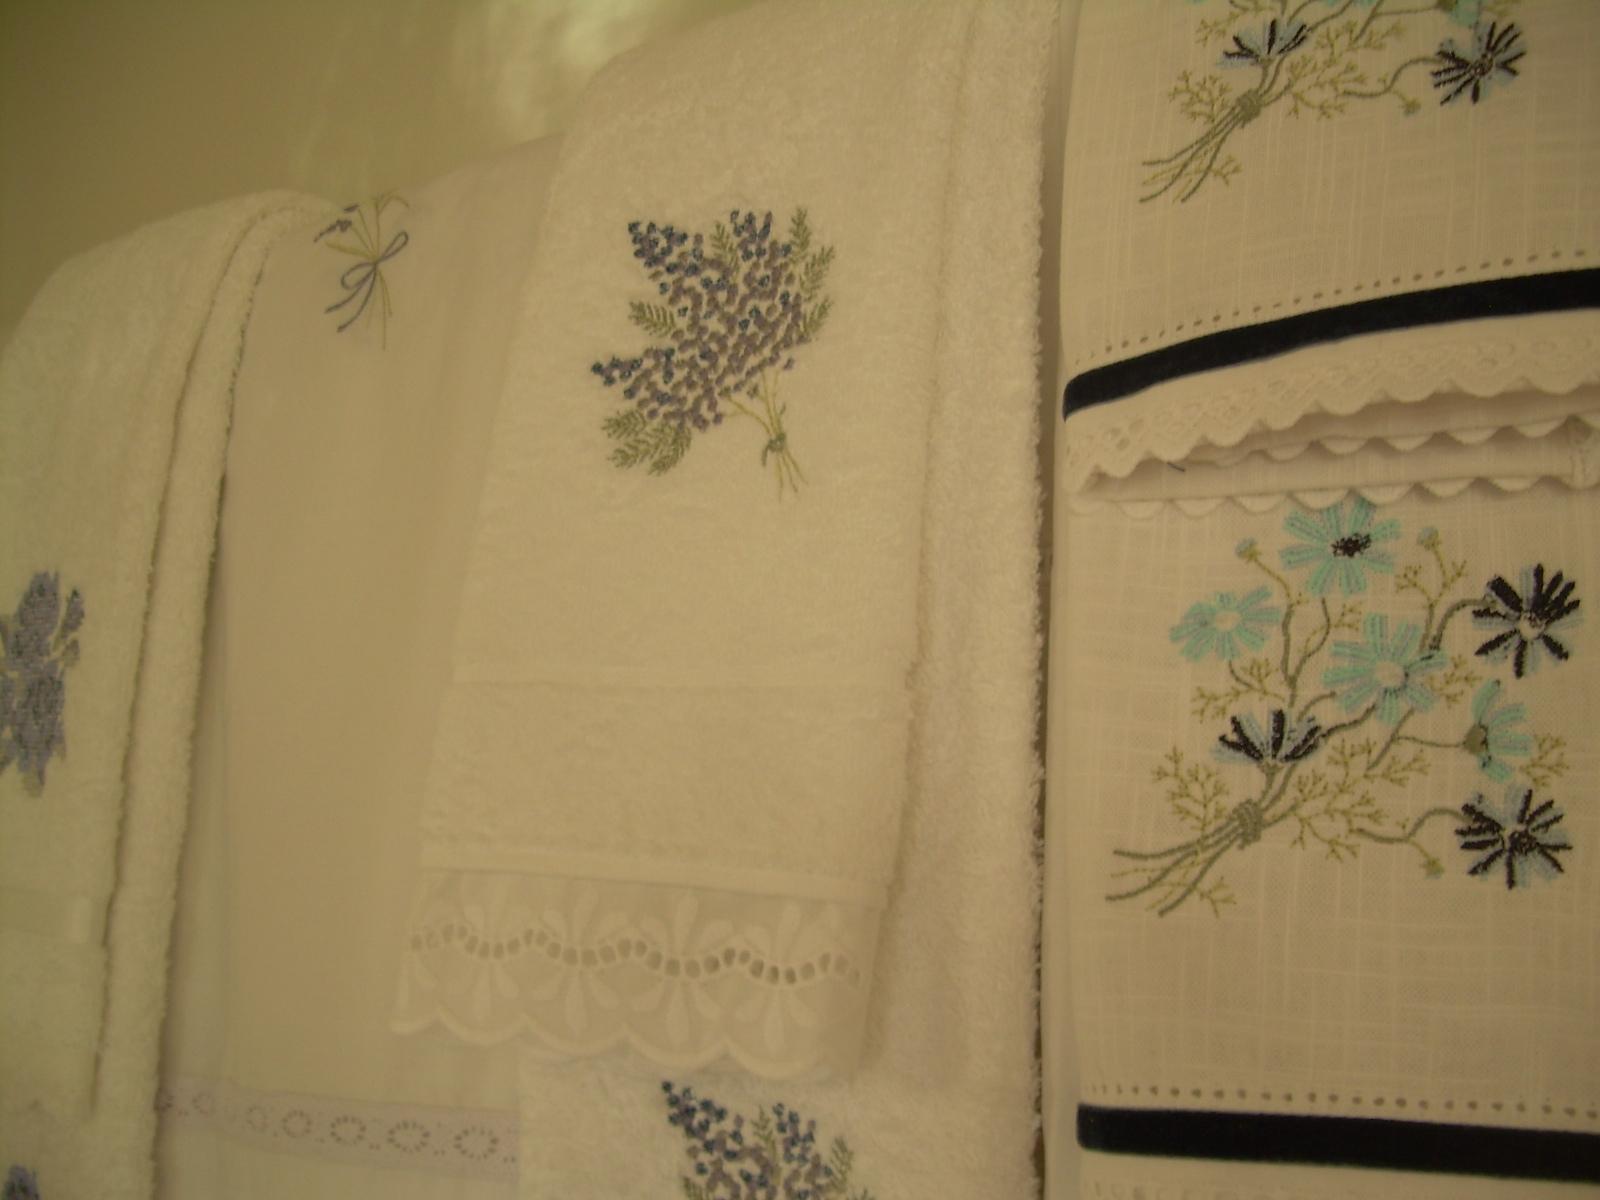 Cortinas De Baño Bordadas:cortina de baño bordada 20 bordados deshilado $ 32 000 cortina de